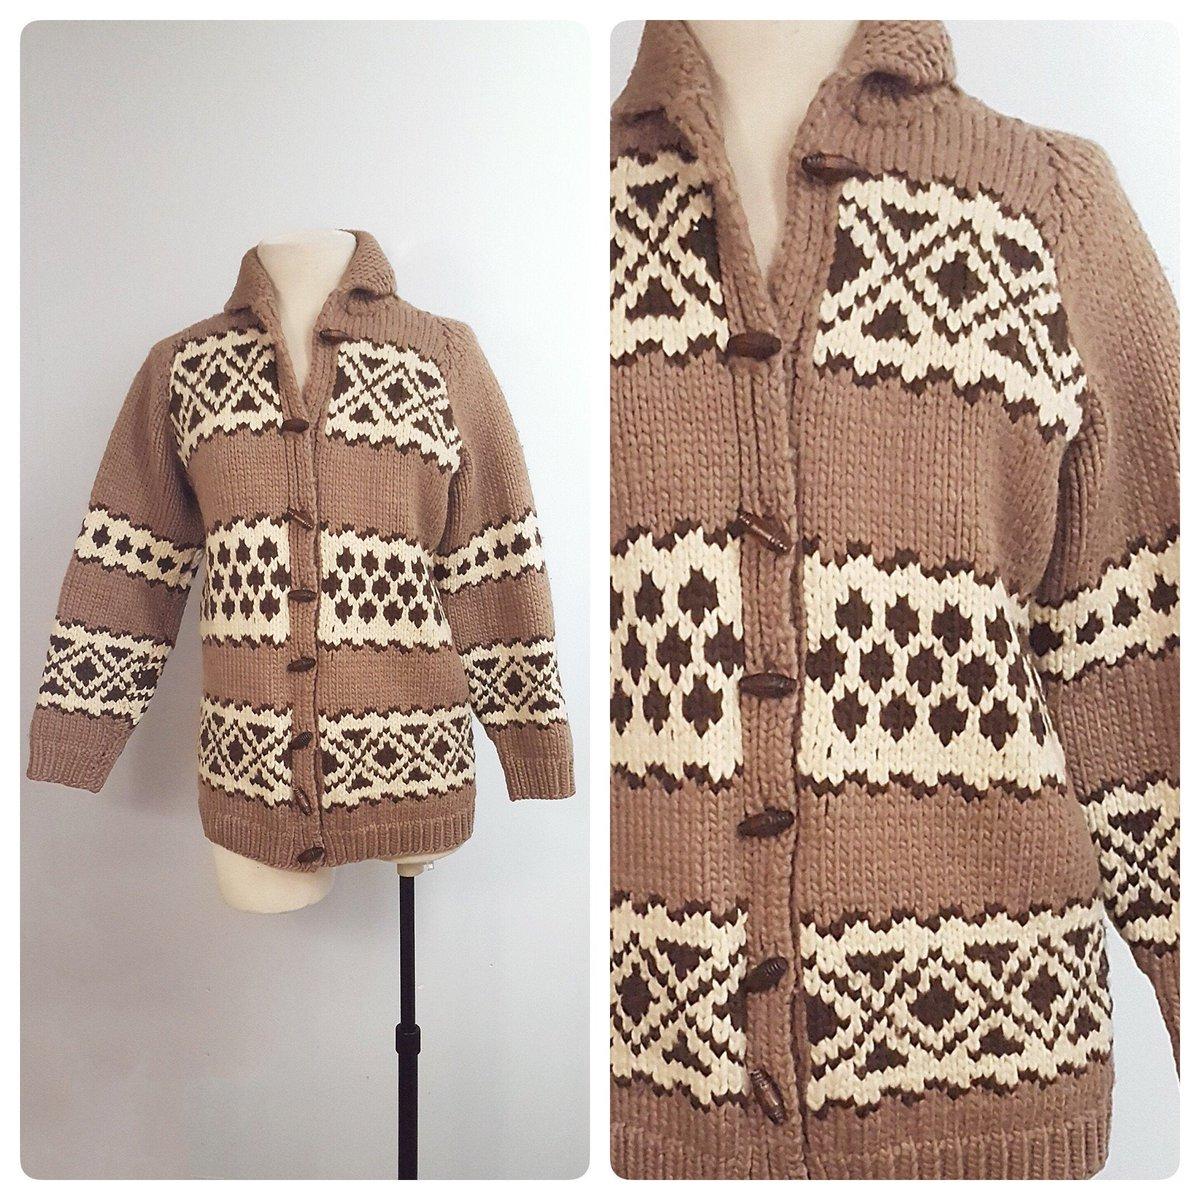 1960s chunky knit cardigan jacket | 60s cowichan style sweater with wood toggles size medium  #Vintagelifestyle #sustainable #vintagefashion #vintageclothing #onlineshopping #Toronto #fashion #retrouverbiz